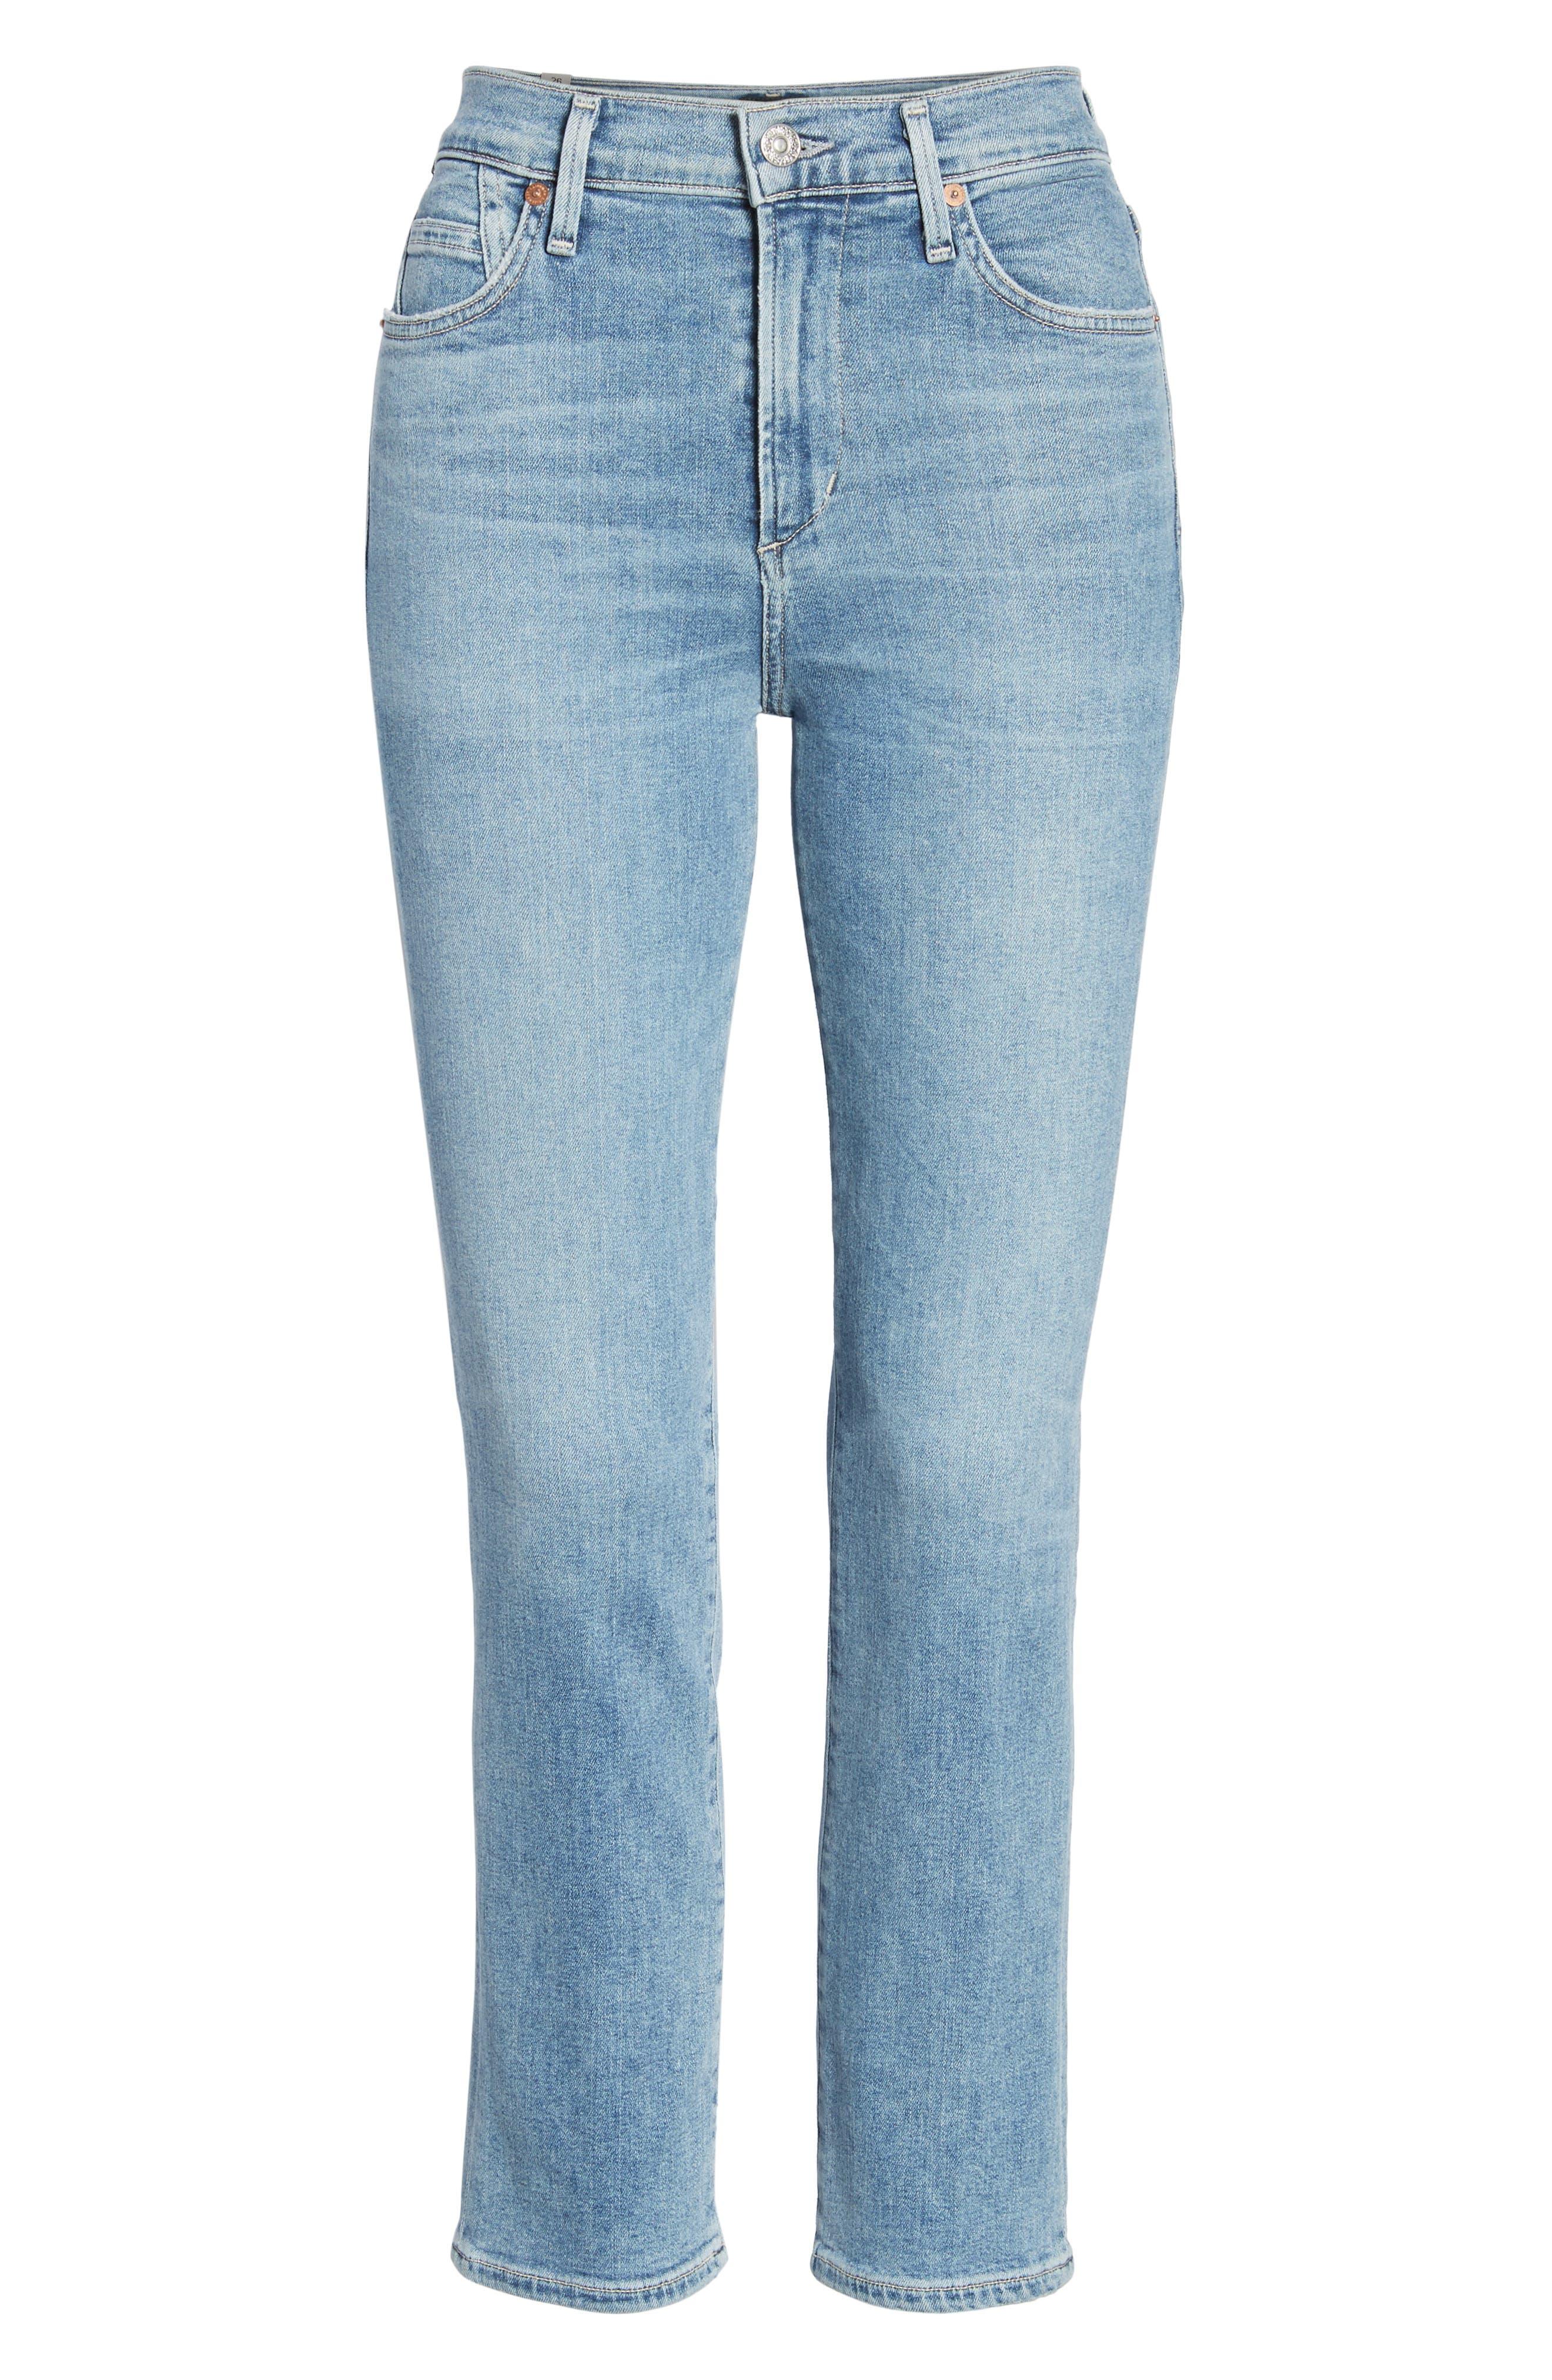 Cara Ankle Cigarette Jeans,                             Alternate thumbnail 7, color,                             Firestone